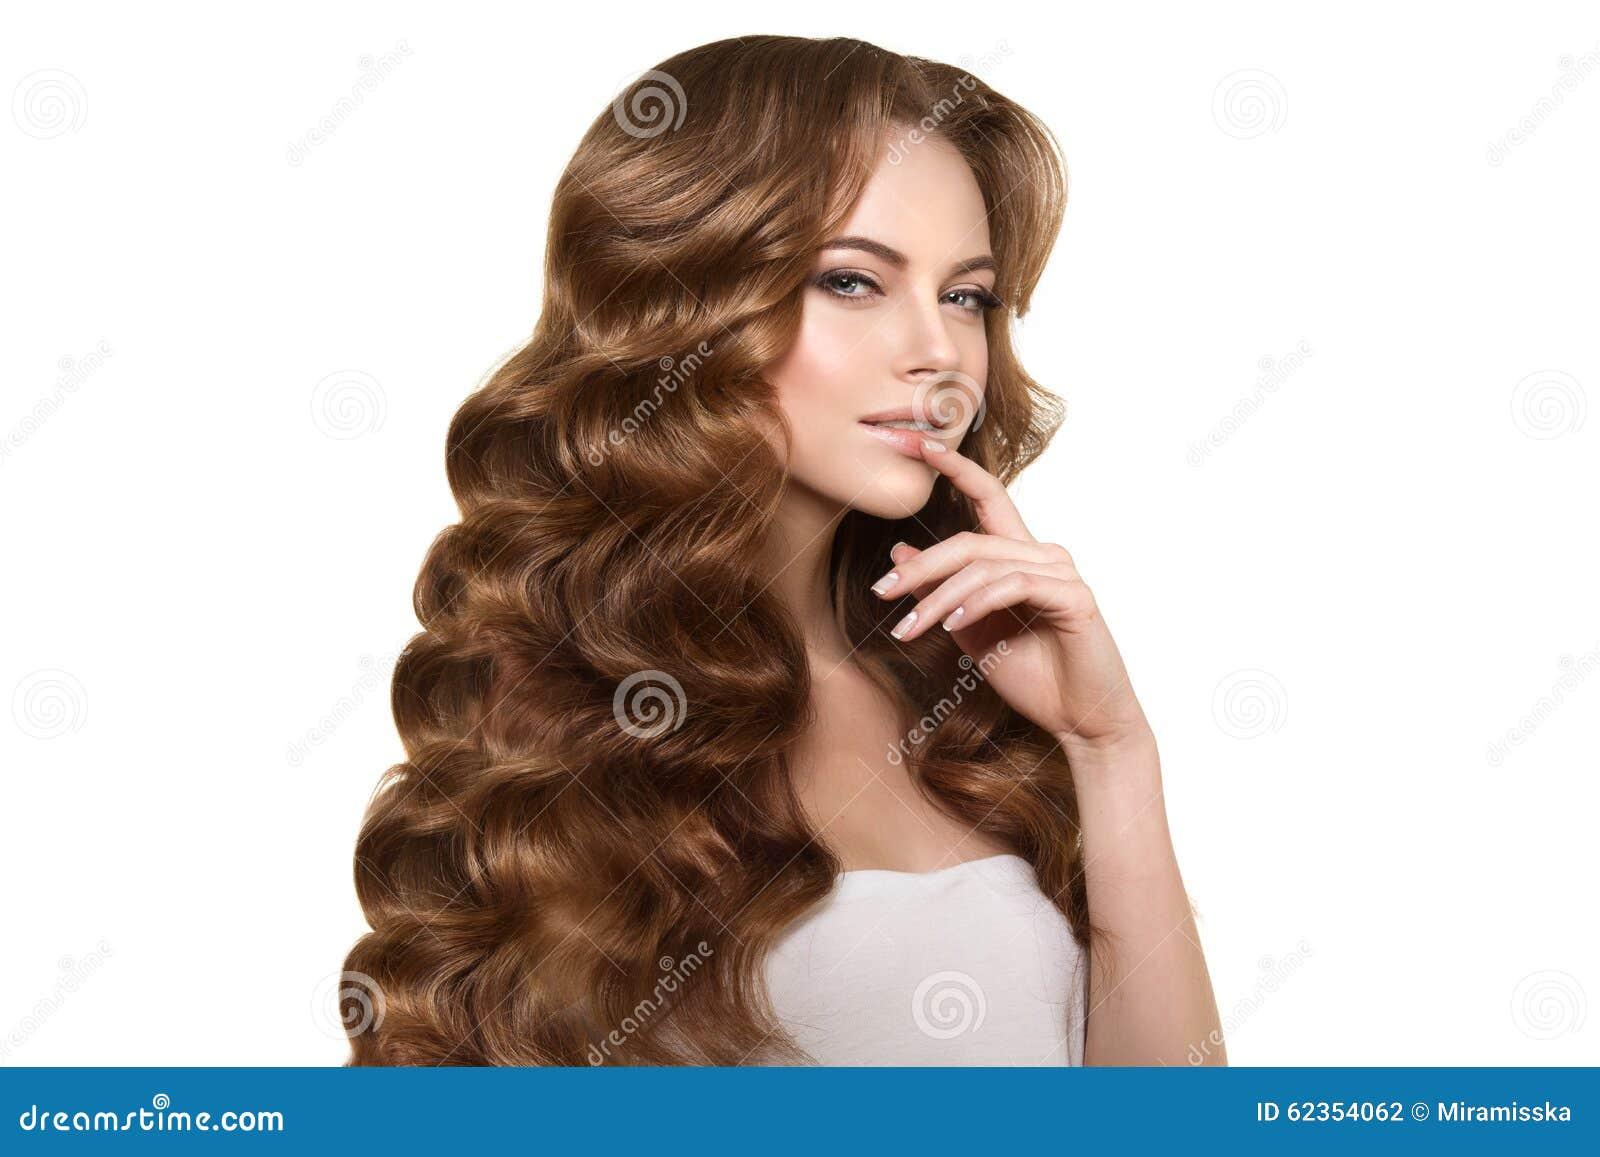 Long Hair. Waves Curls Hairstyle. Hair Salon. Updo. Fashion Mode Stock ...